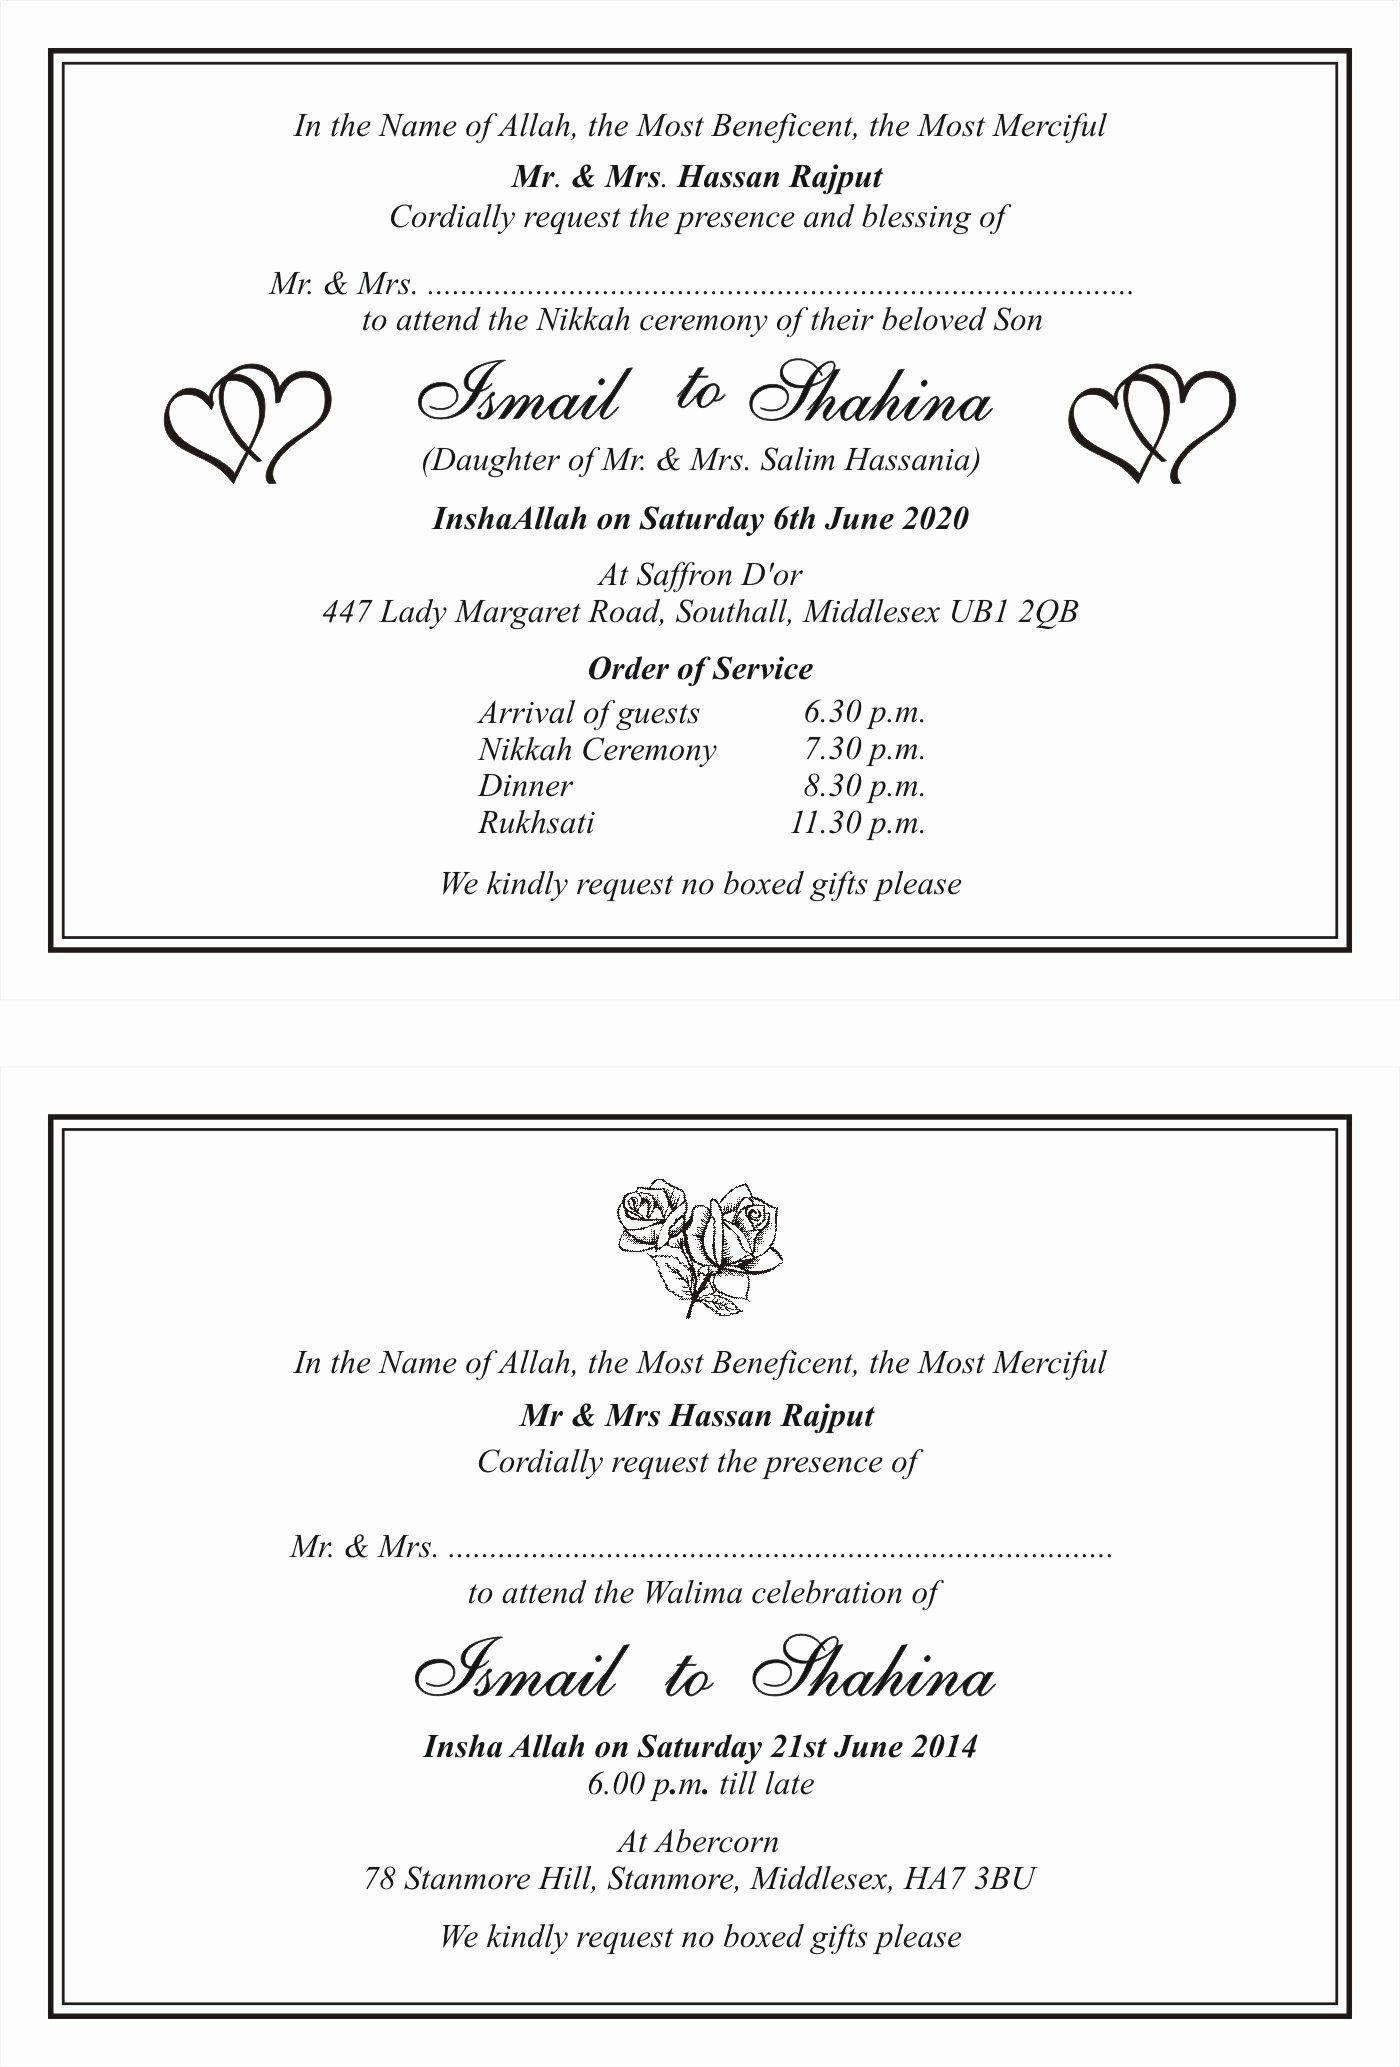 Muslim Wedding Invitation Templates Muslim Wedding Invitations Modern Wedding Invitation Wording Muslim Wedding Cards